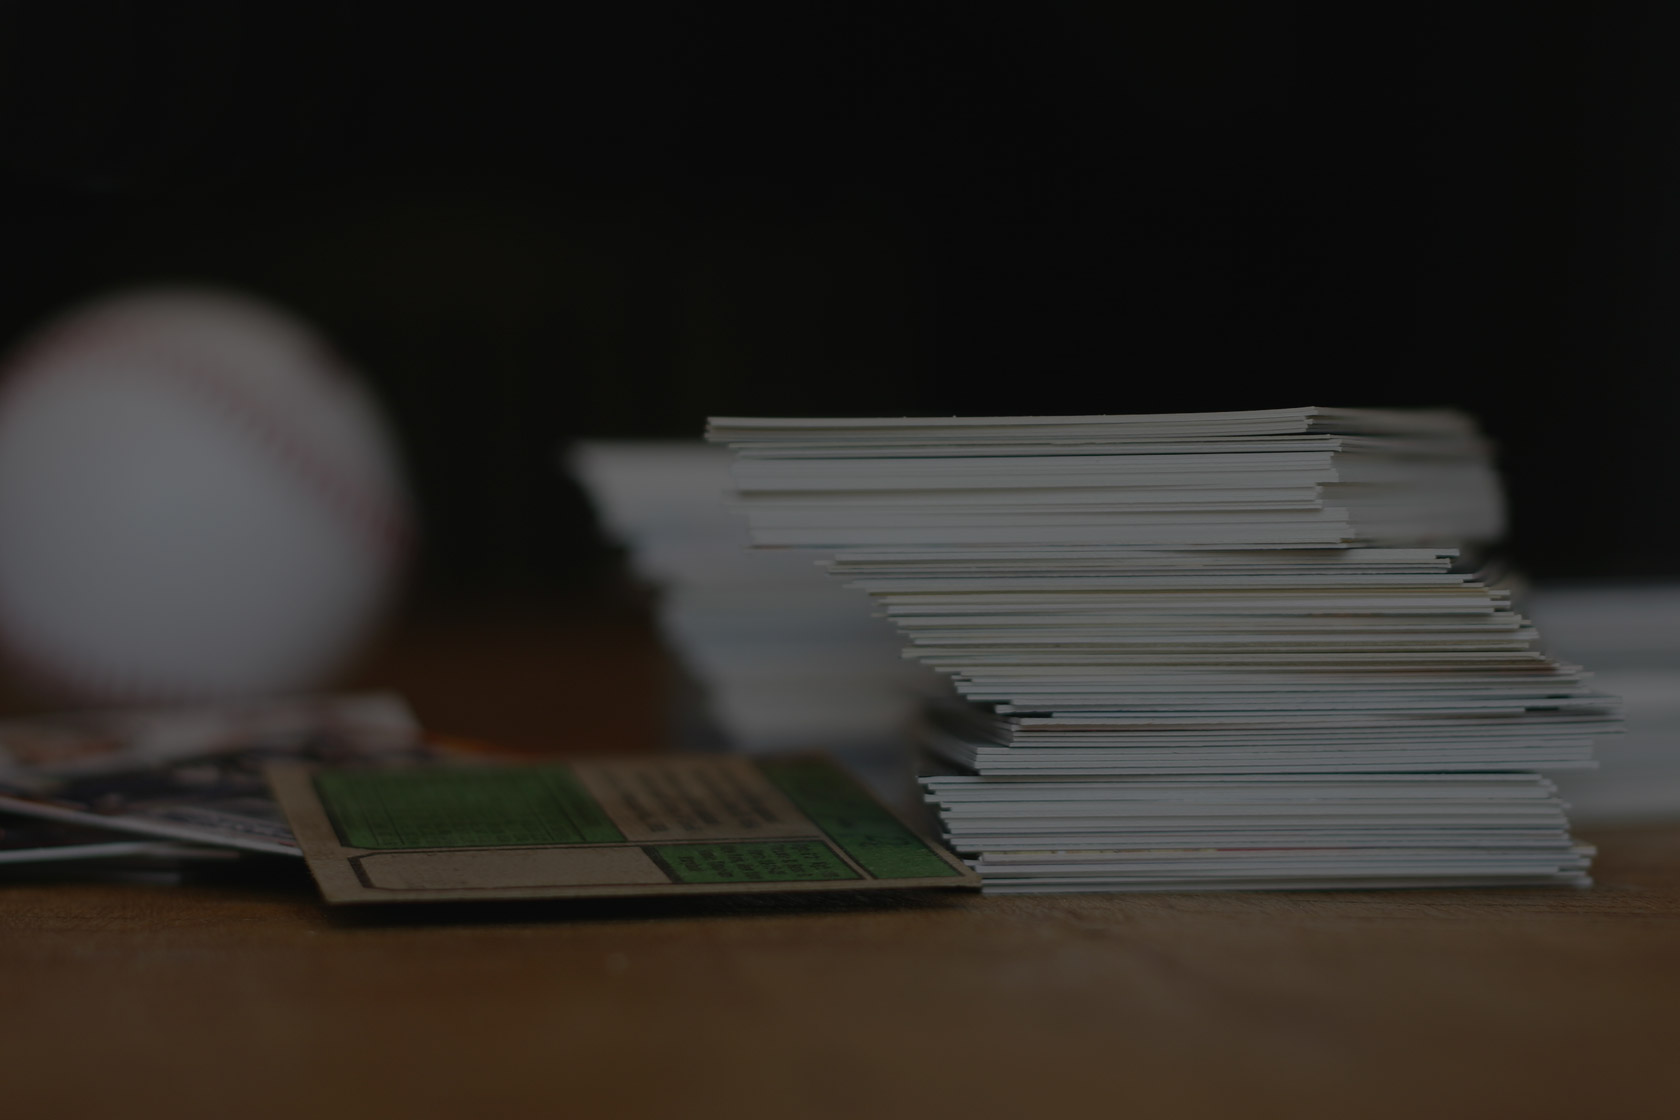 stack of baseball cards